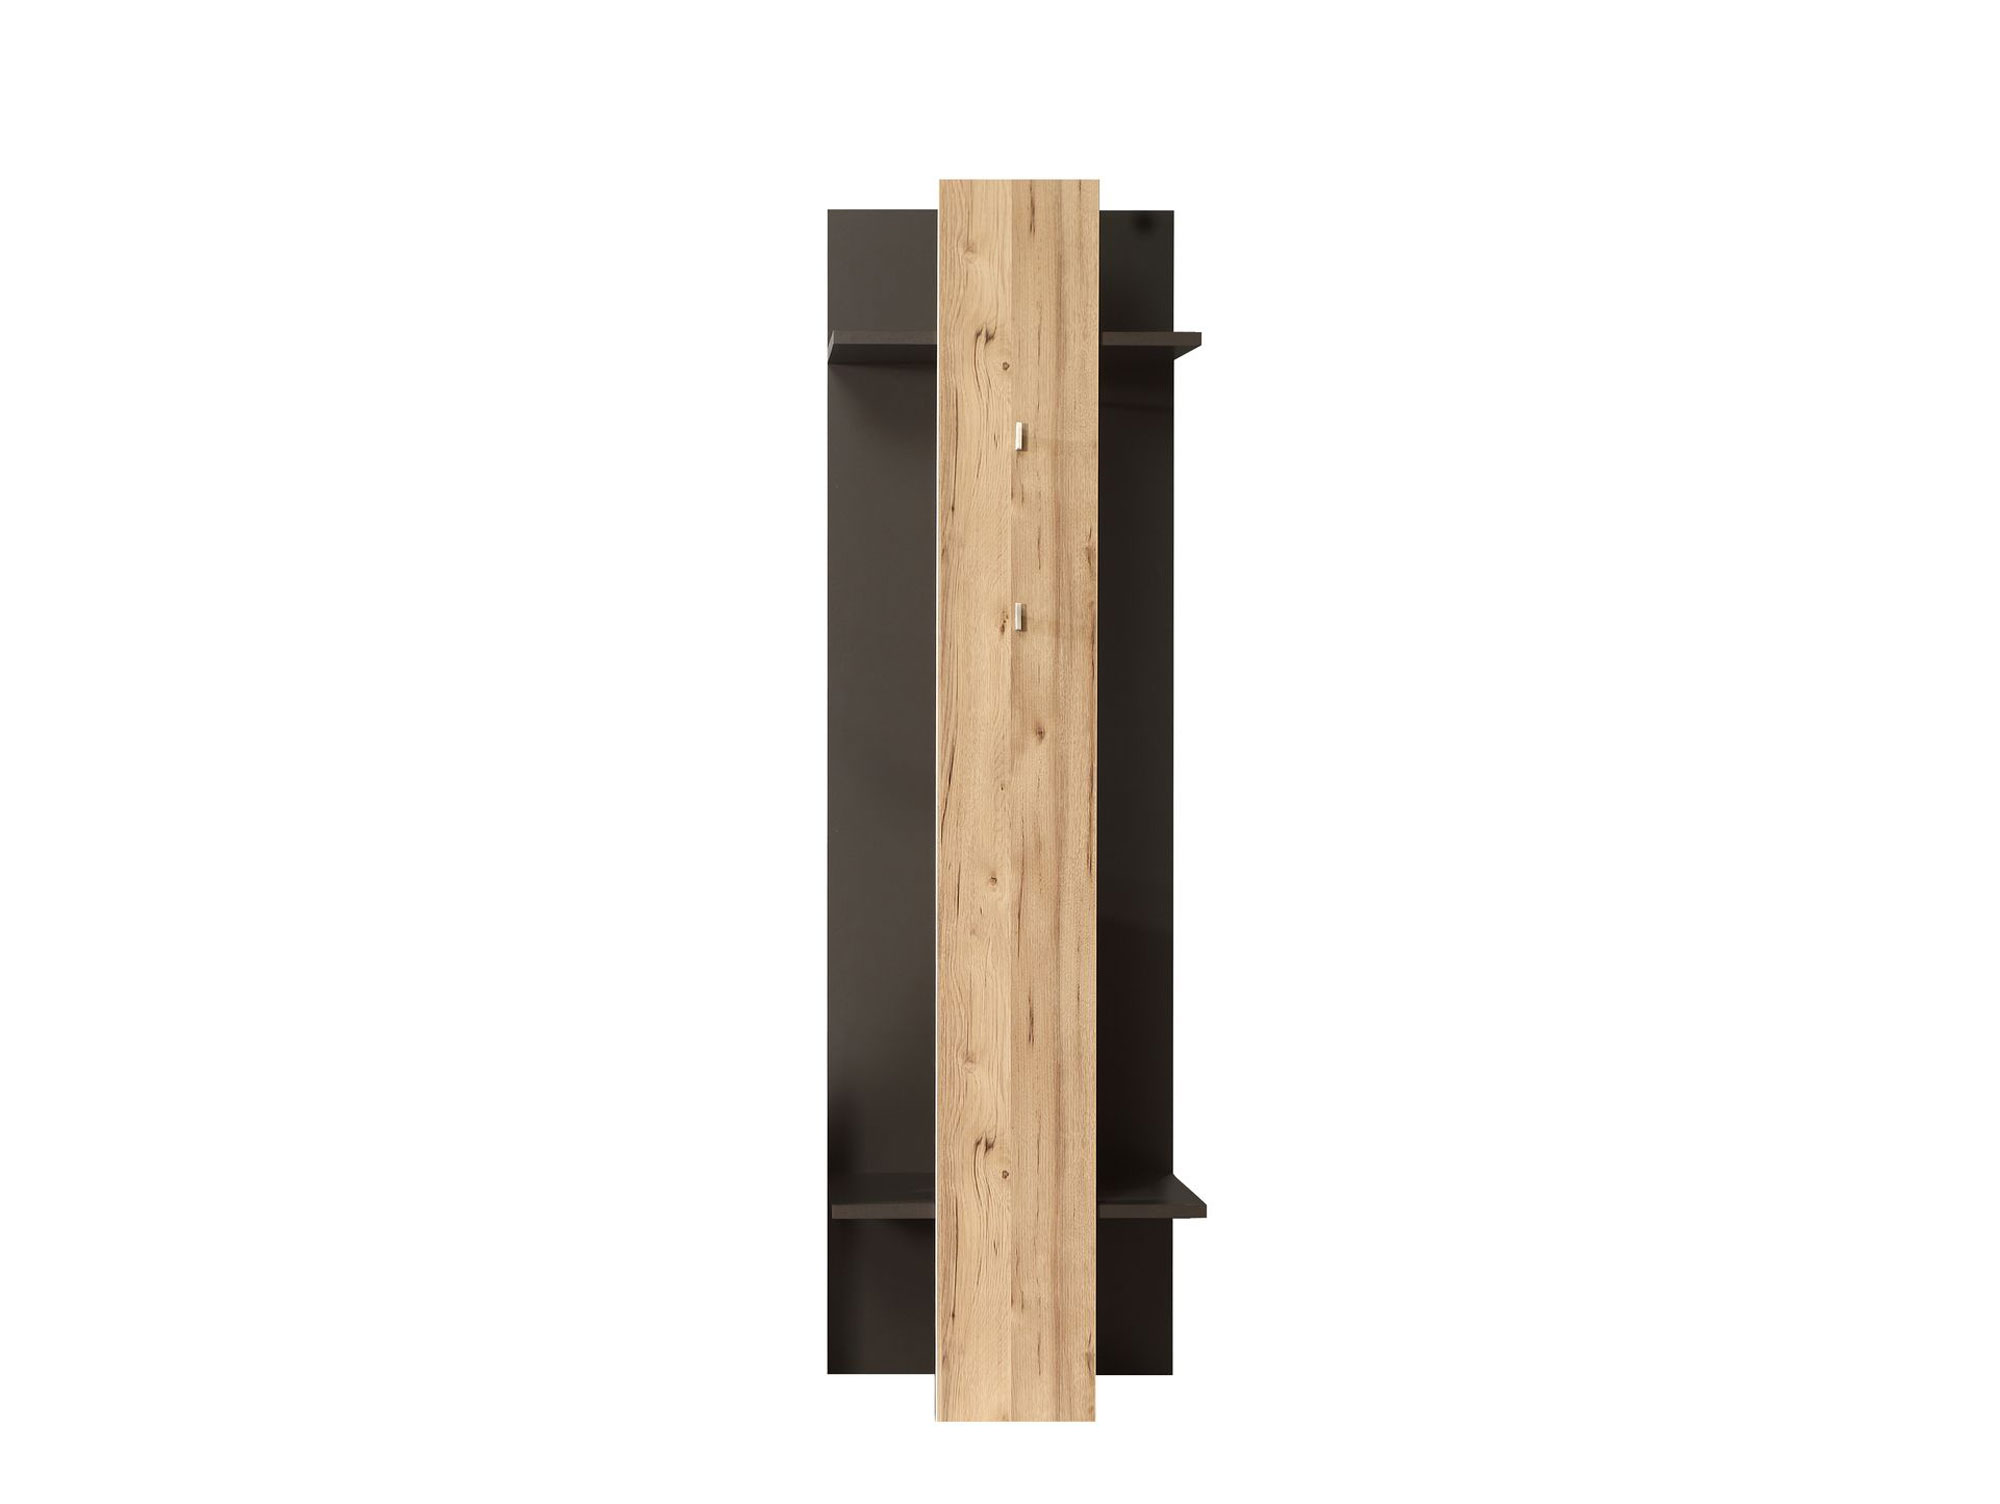 Garderobenpaneel clara grau planked eiche for Garderobenpaneel grau